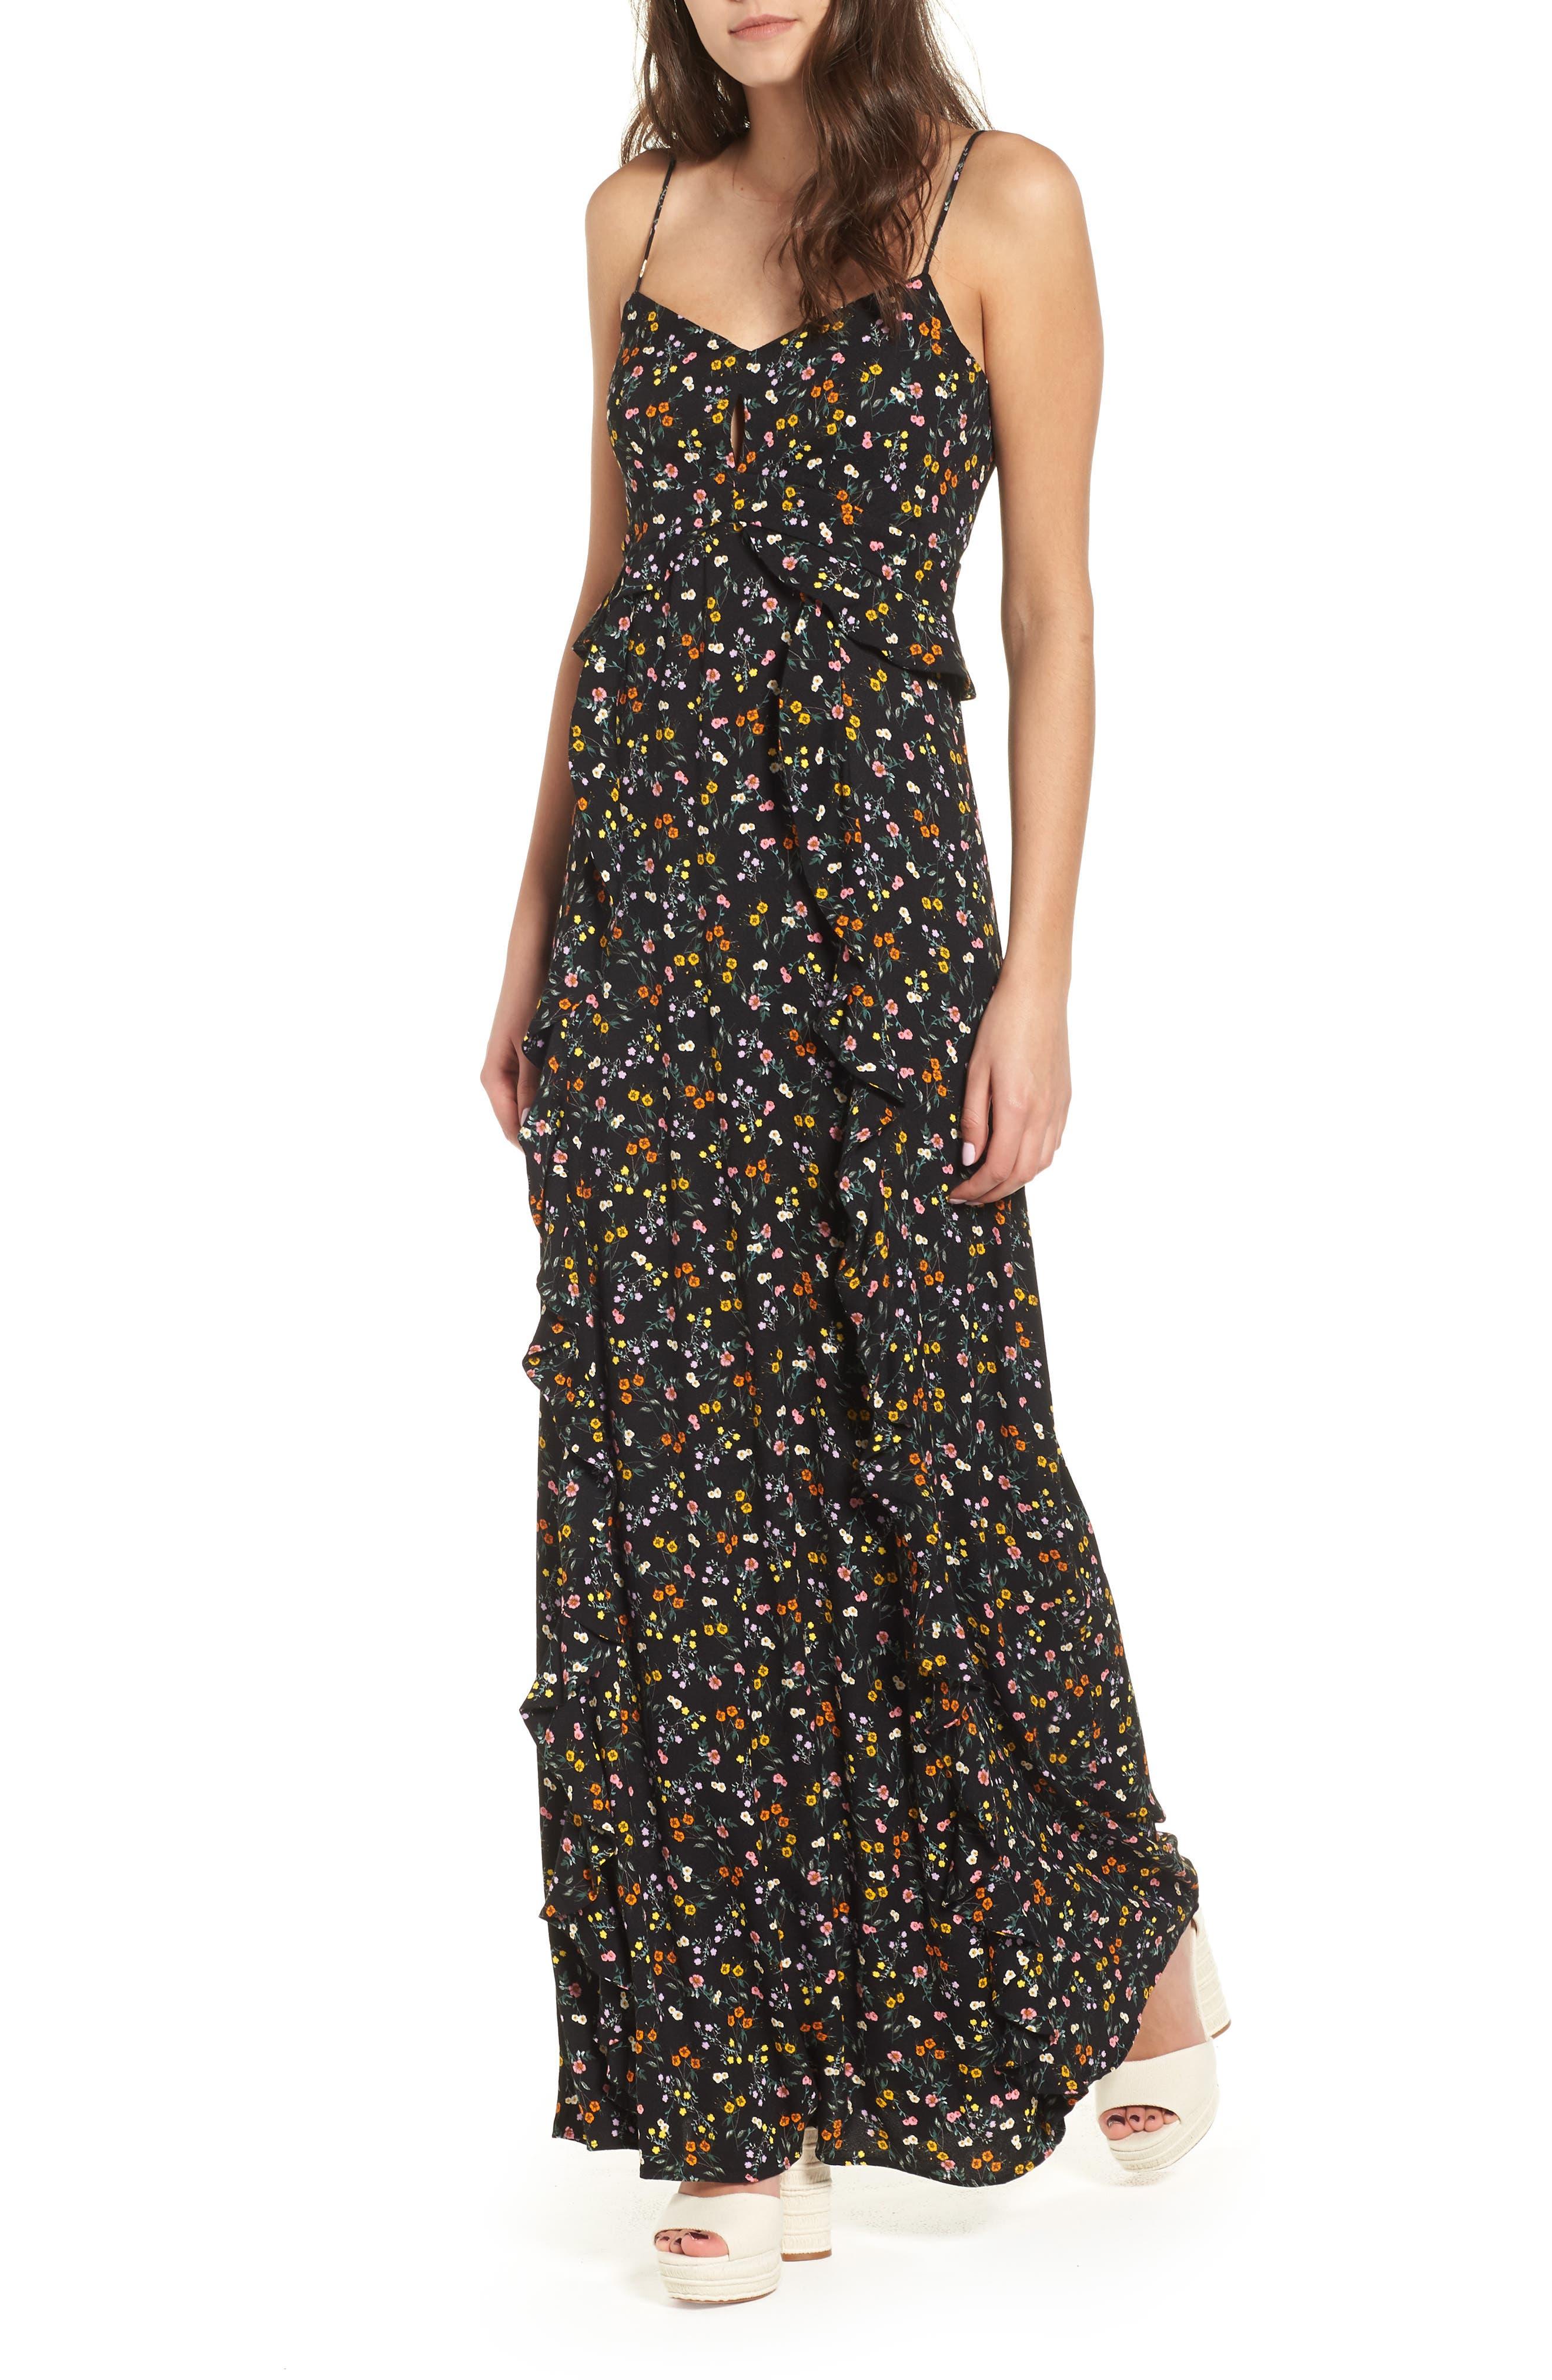 Kiki Ruffle Maxi Dress,                         Main,                         color, Noir Petite Fleur